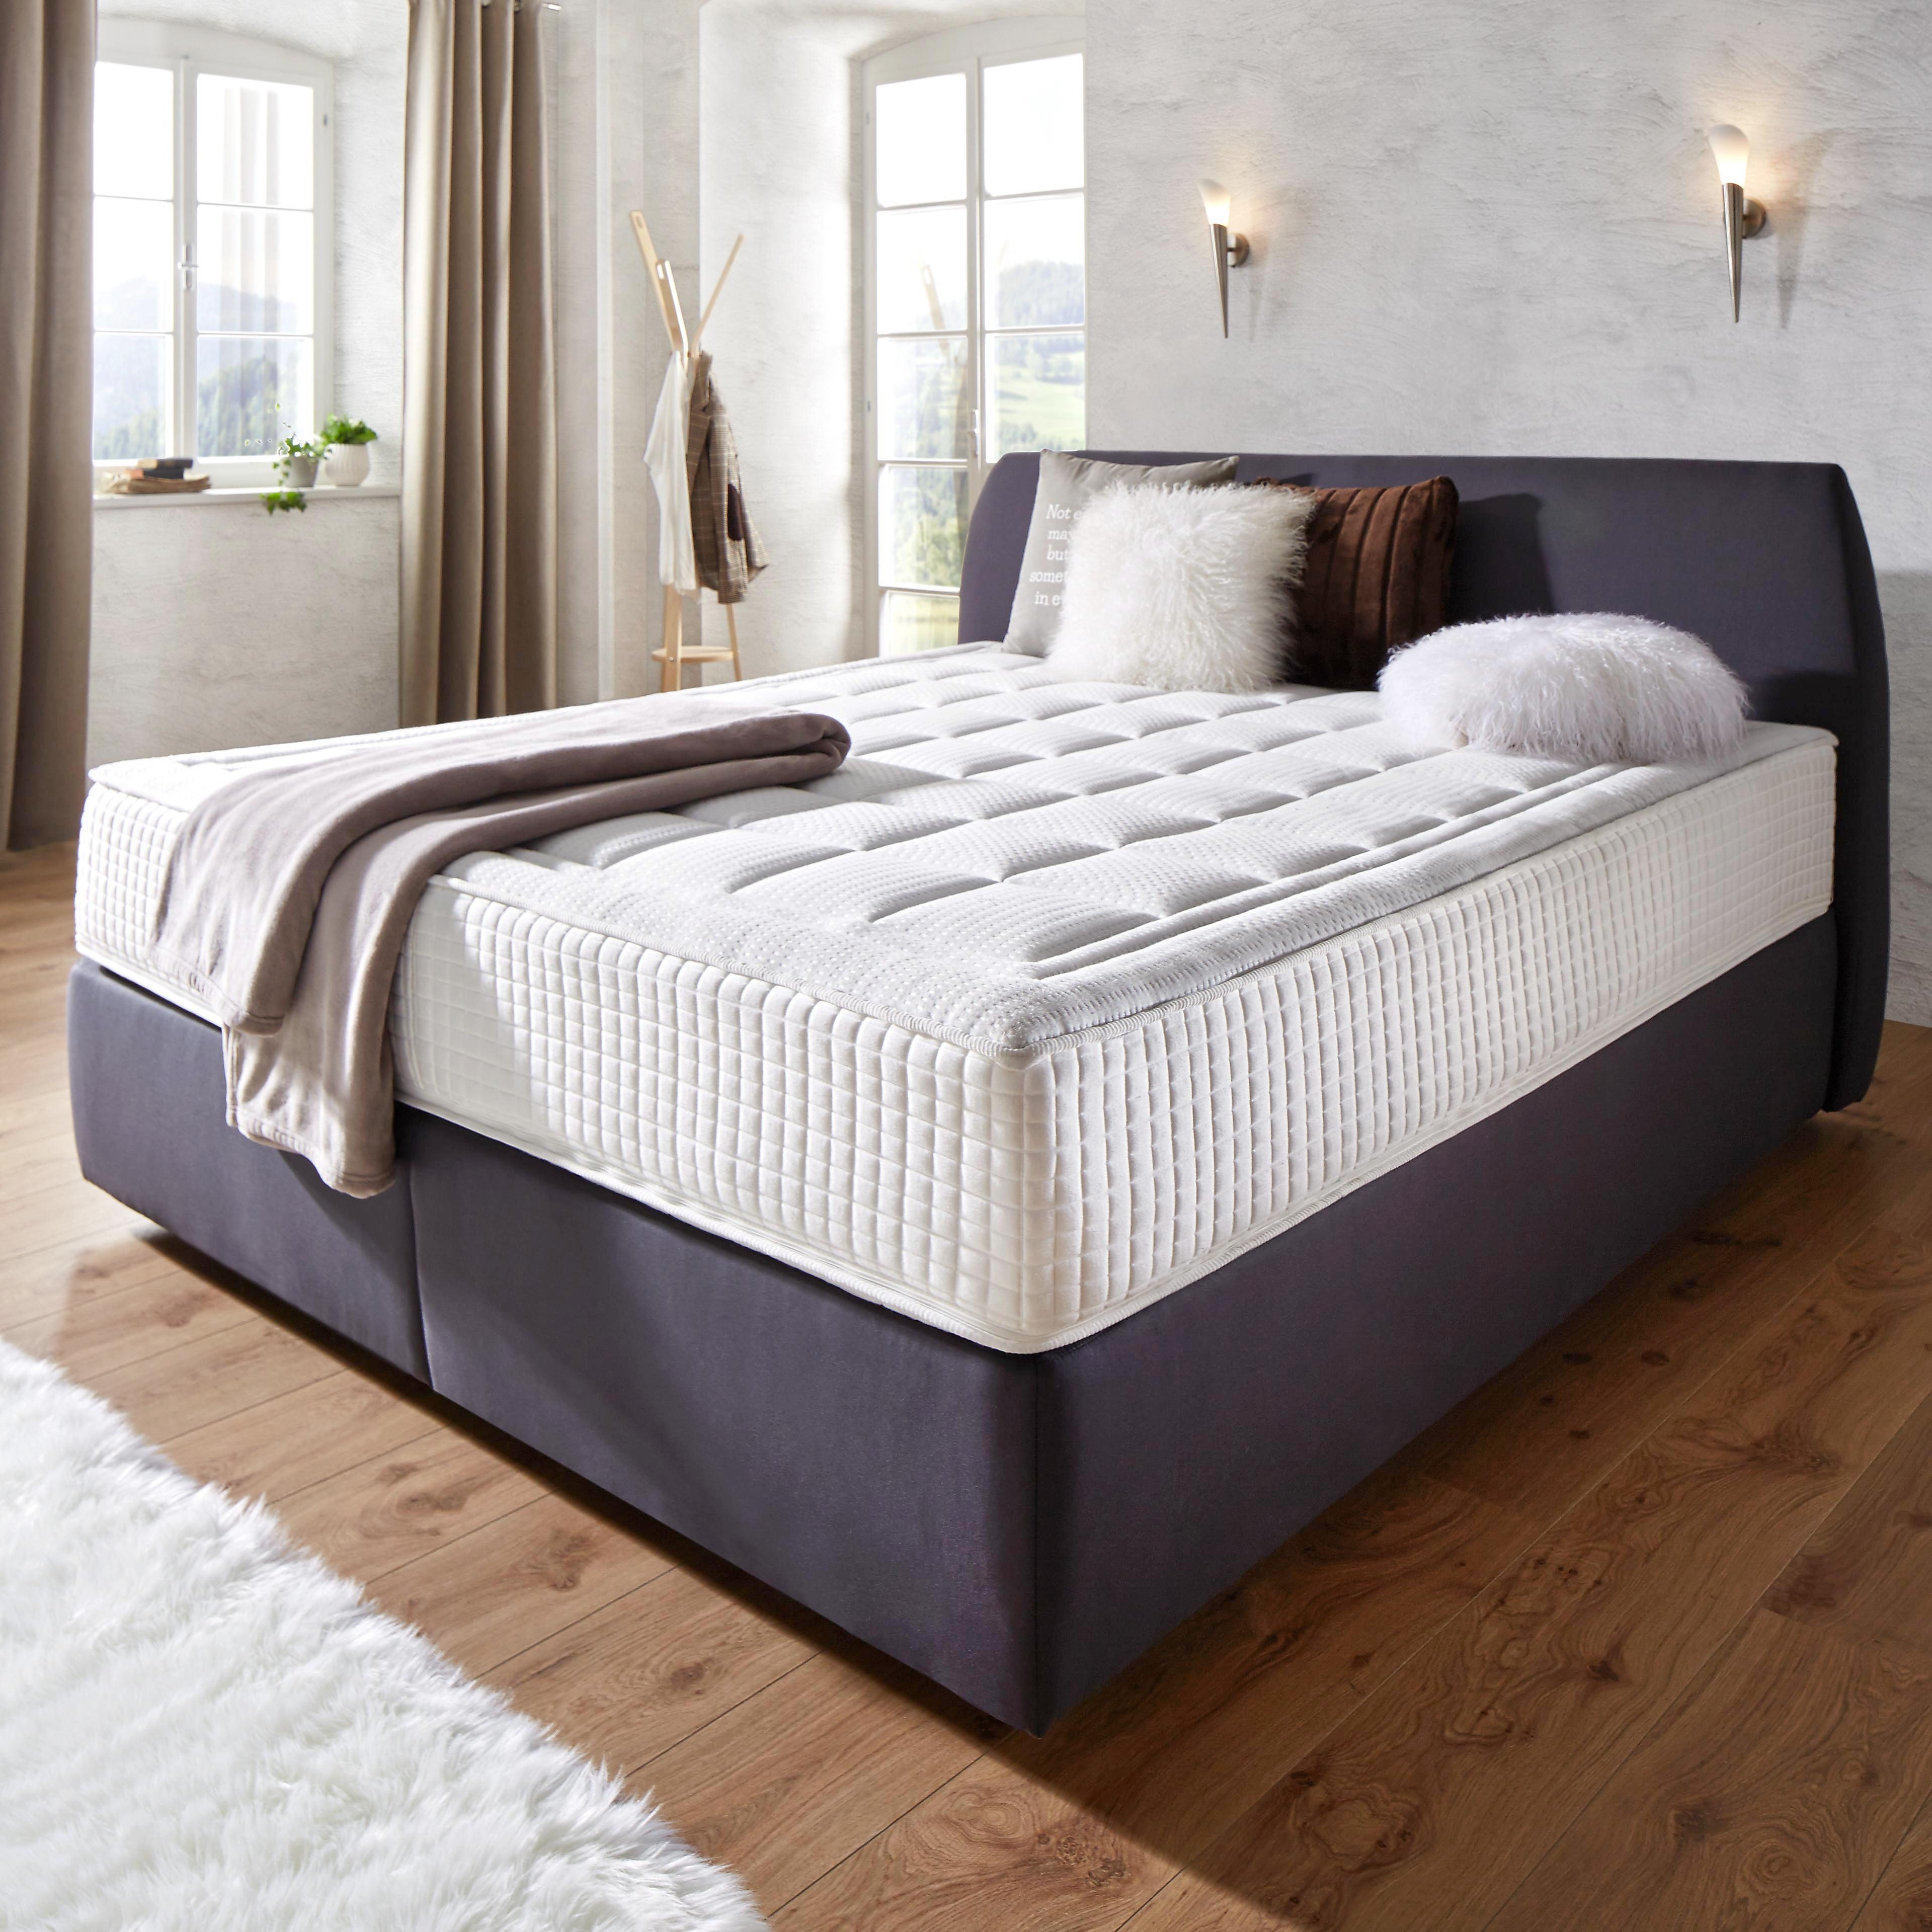 Fellkissen Sheep in Taupe, ca. 40x40cm - Taupe/Weiß, Textil (40/40cm) - MÖMAX modern living